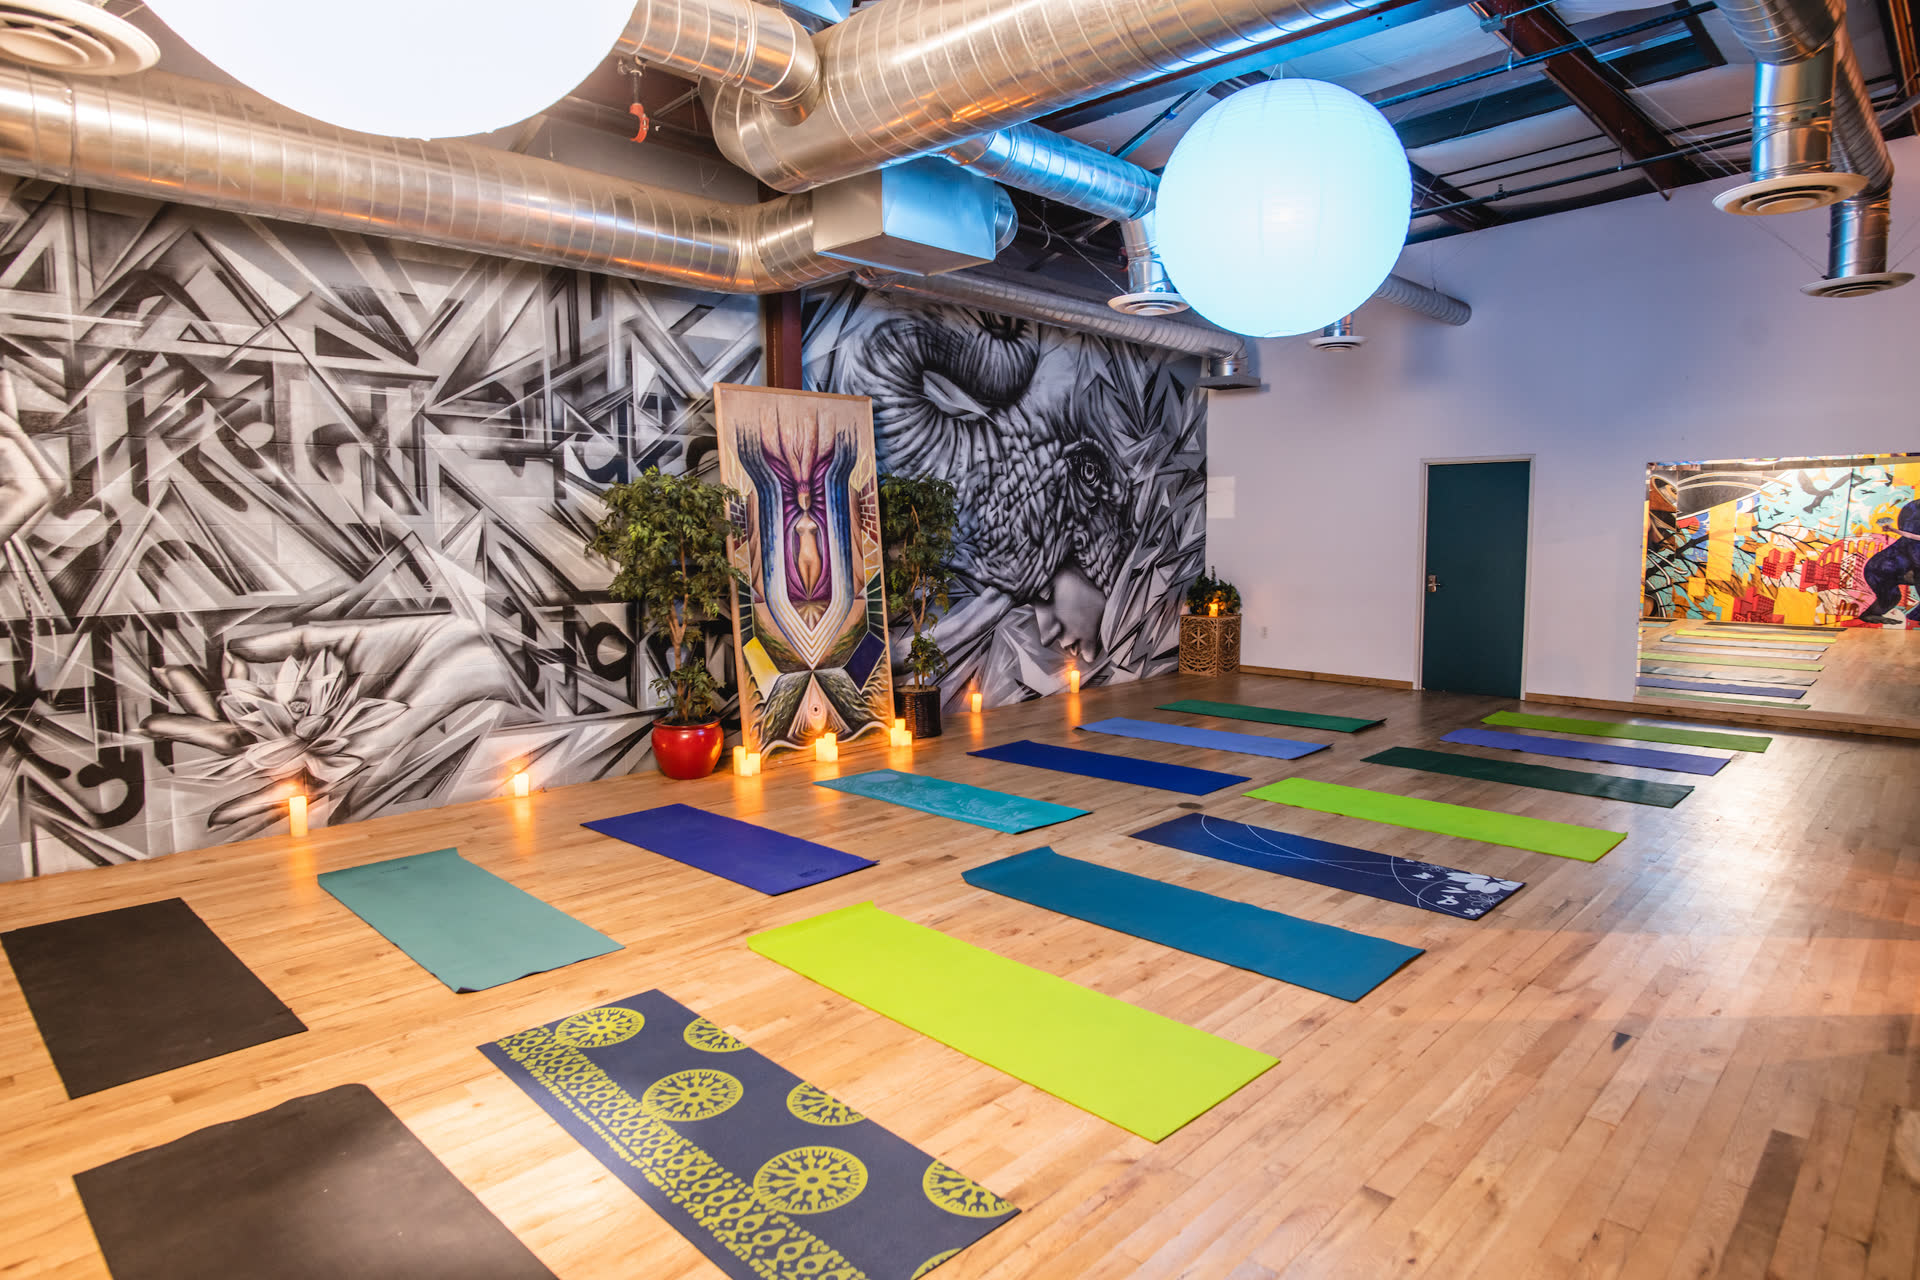 Yoga Studio spaces